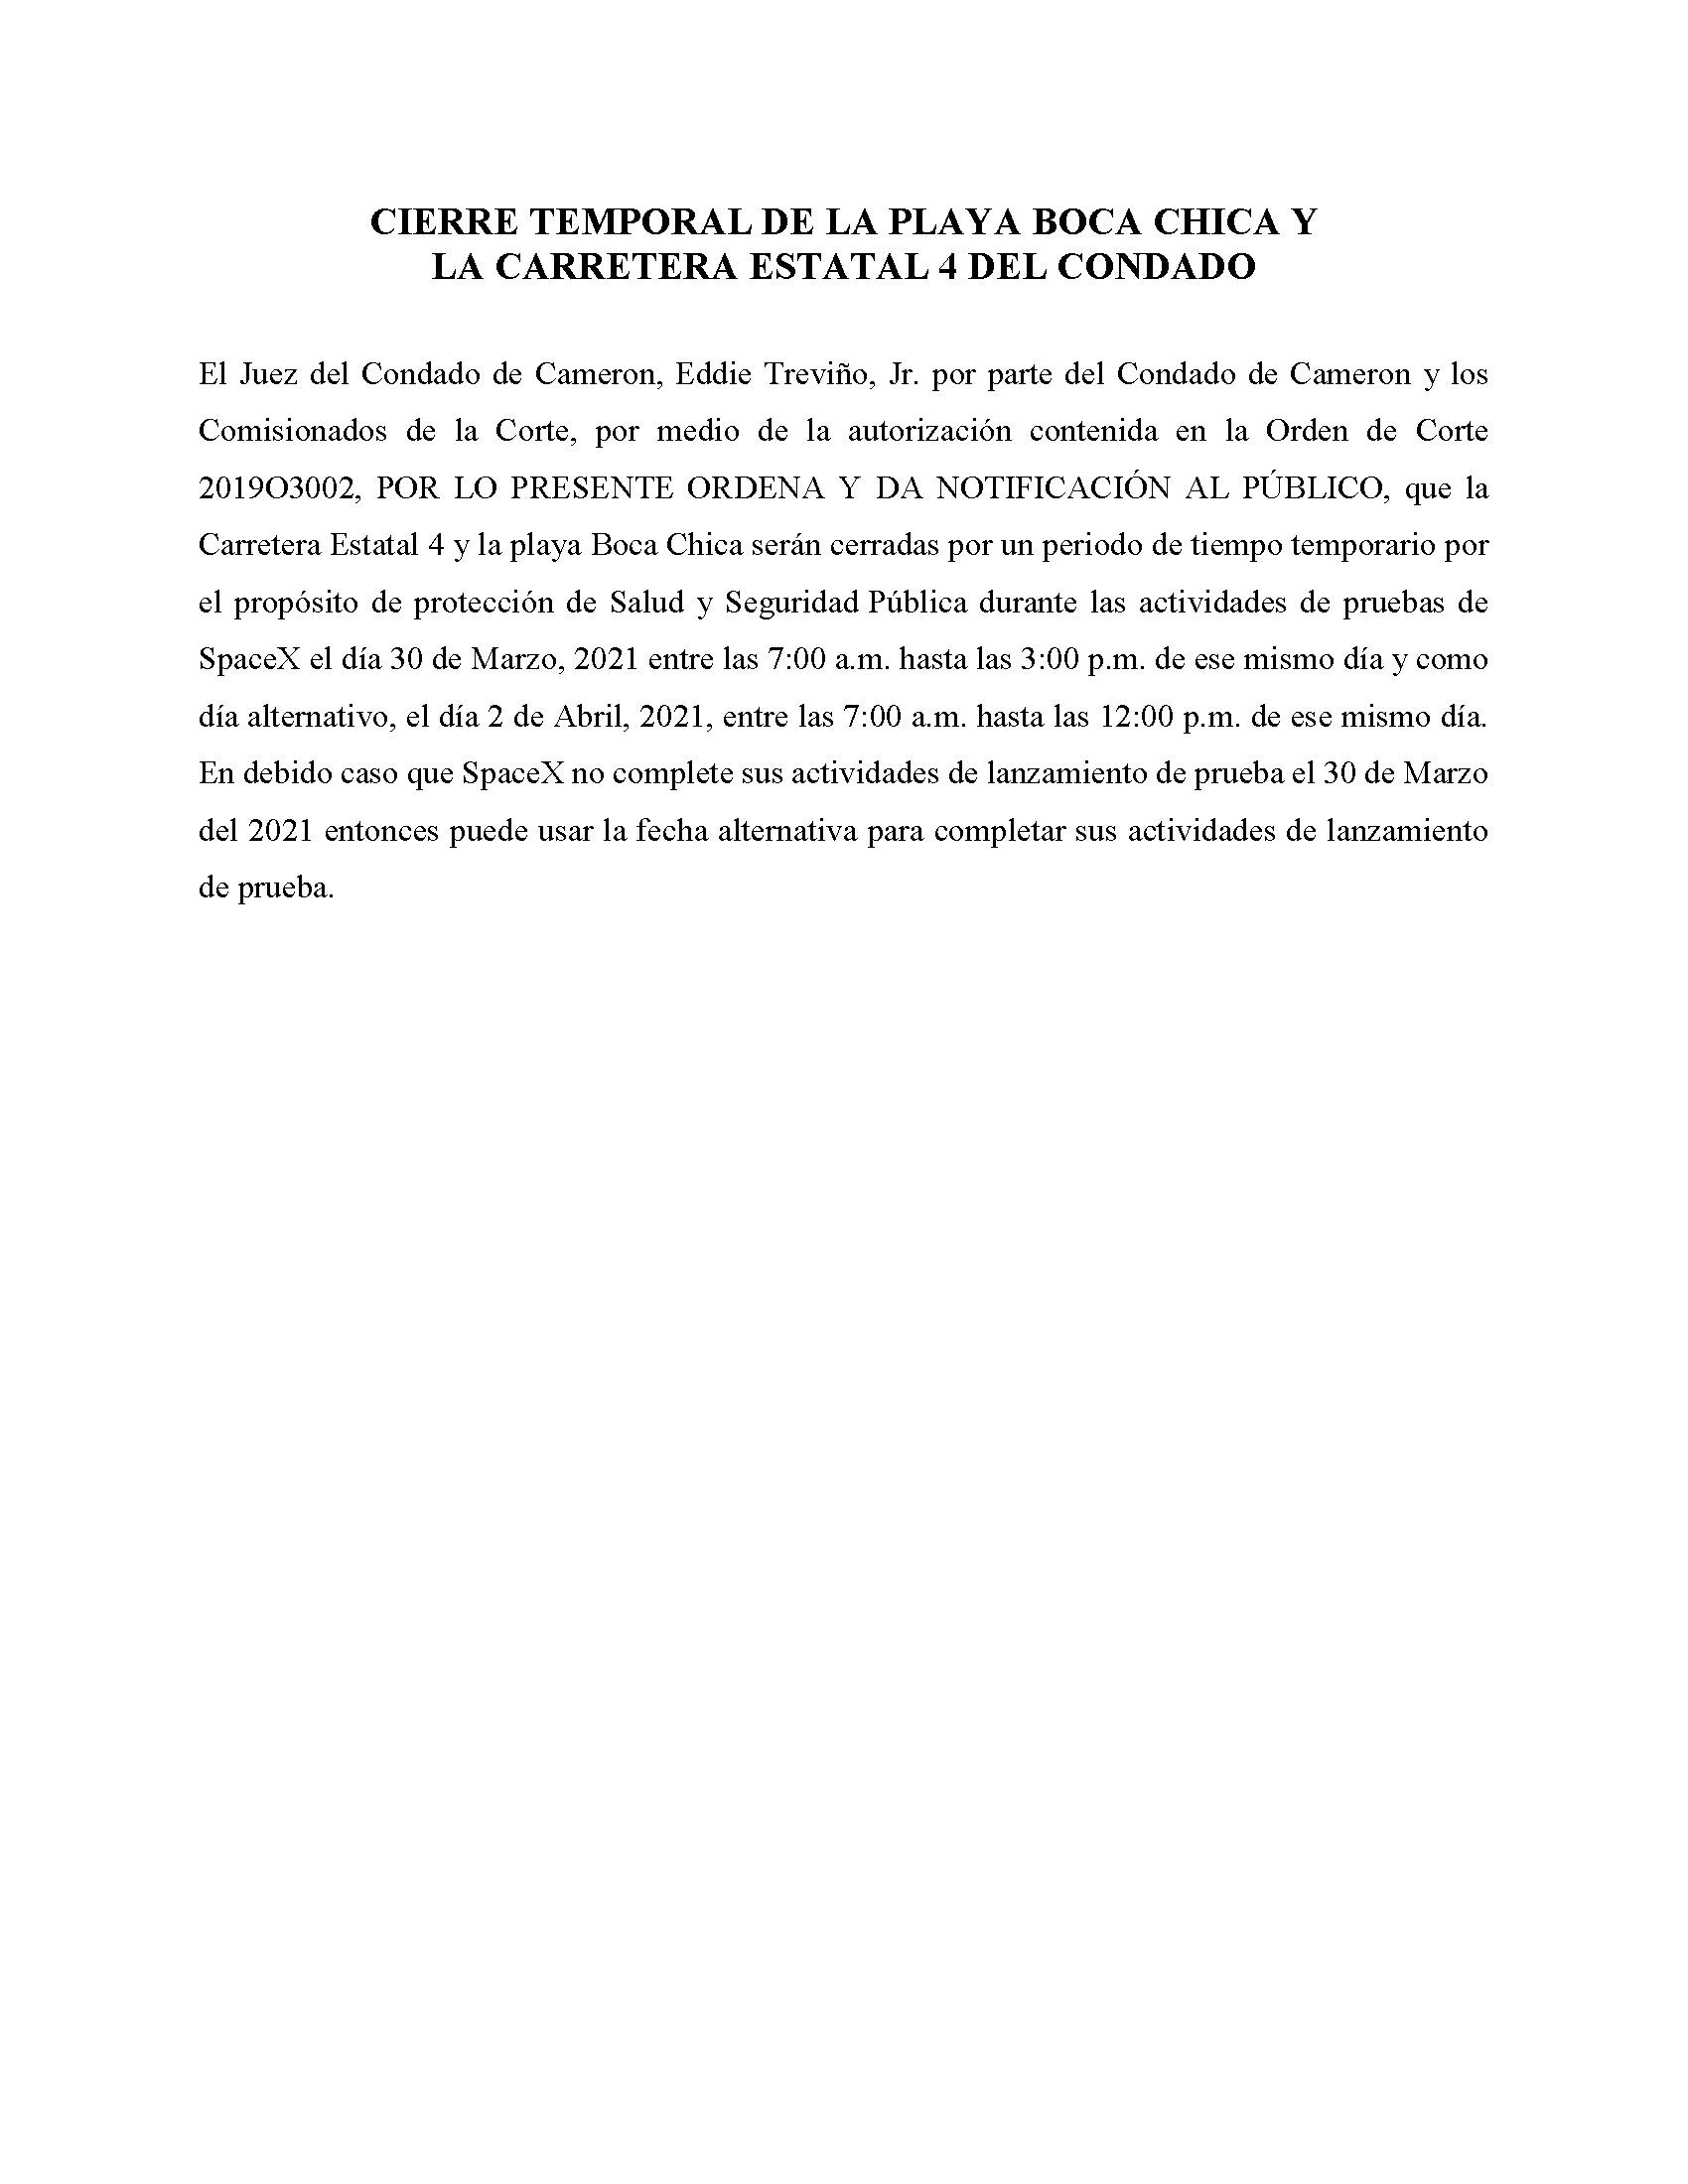 ORDER.CLOSURE OF HIGHWAY 4 Y LA PLAYA BOCA CHICA.SPANISH.03.30.2021and04.02.2021